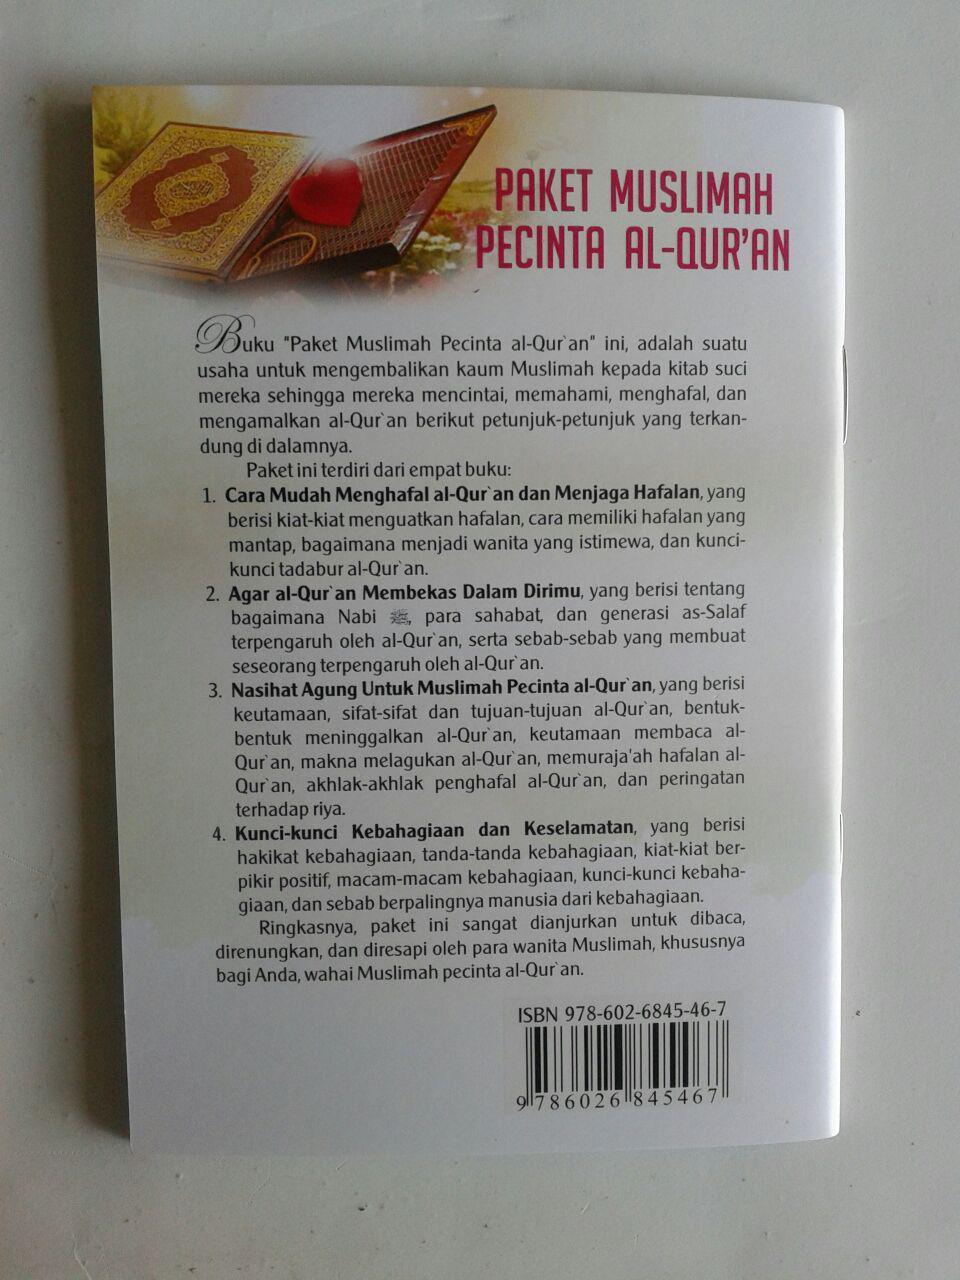 Paket Buku Muslimah Pecinta Al-Qur'an cover